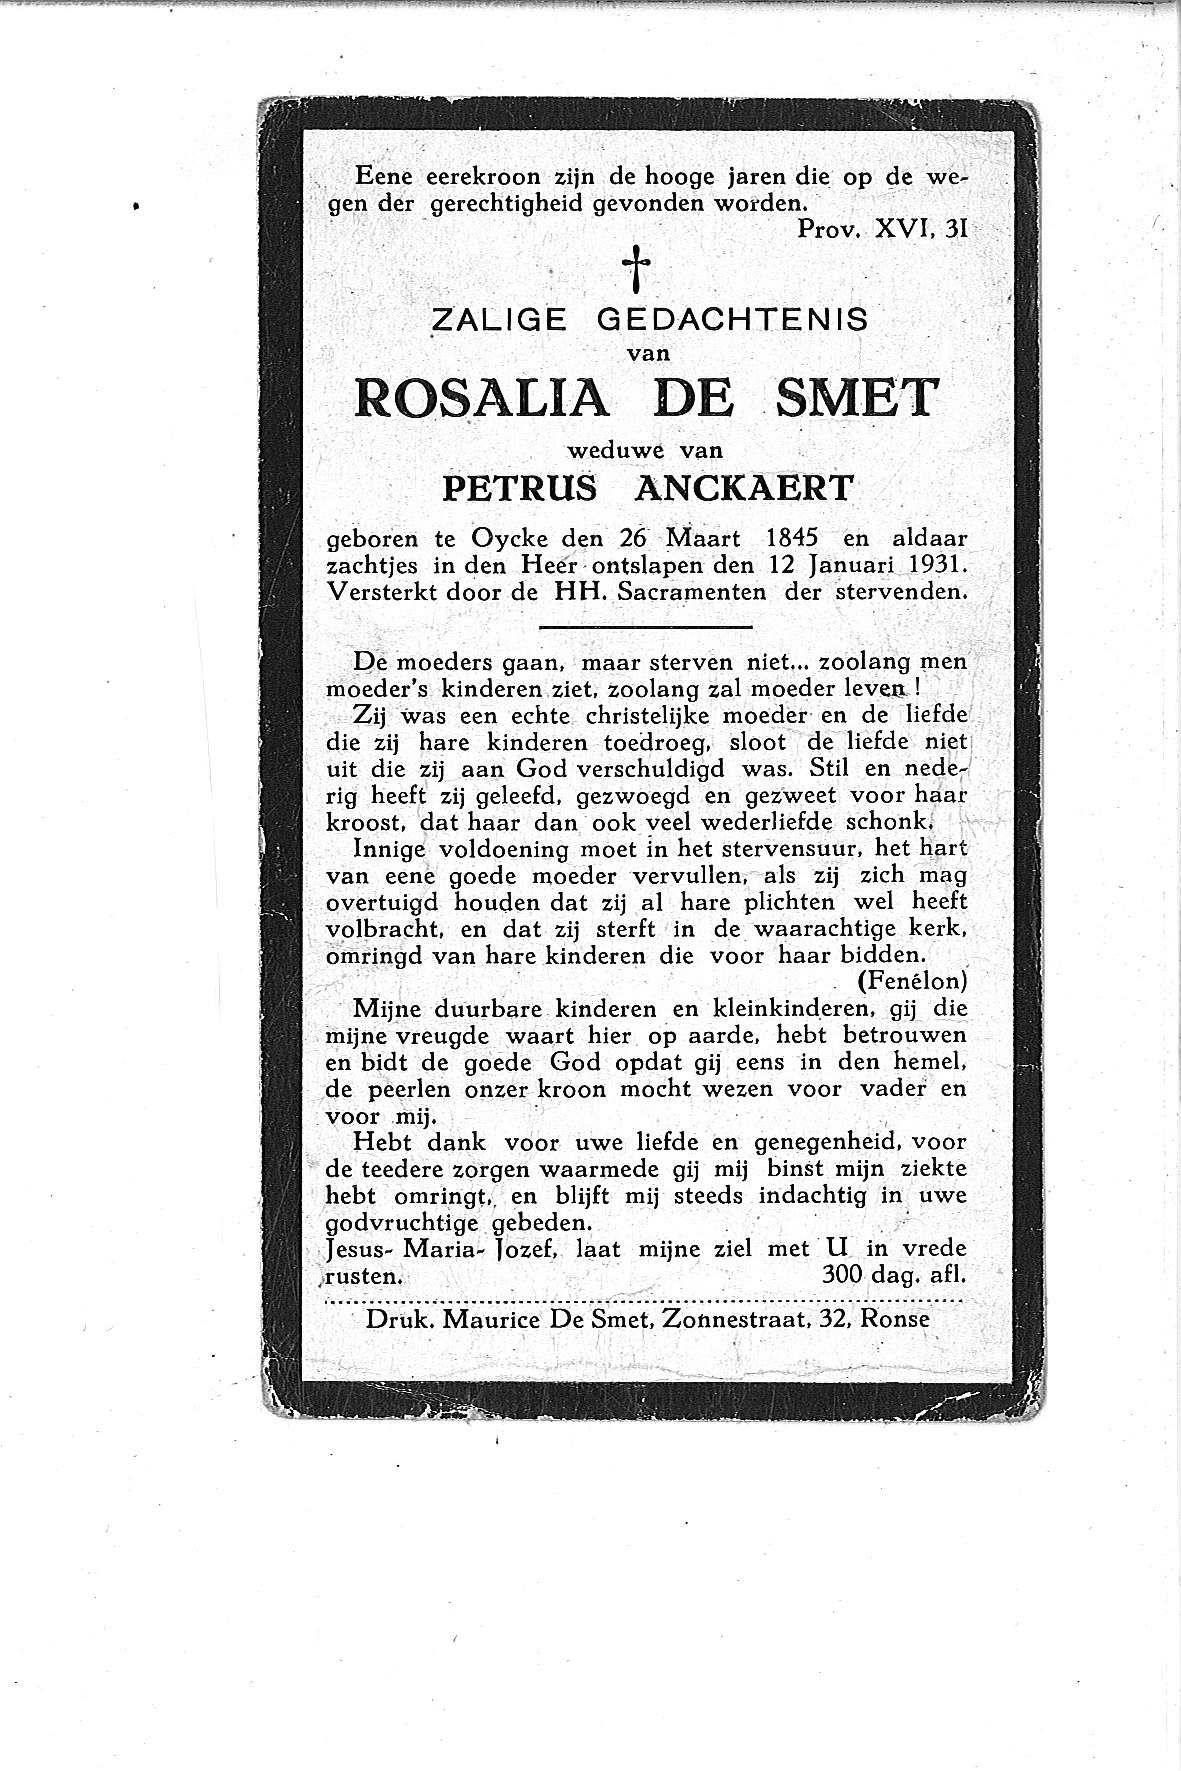 Rosalia (1931) 20120424113911_00202.jpg